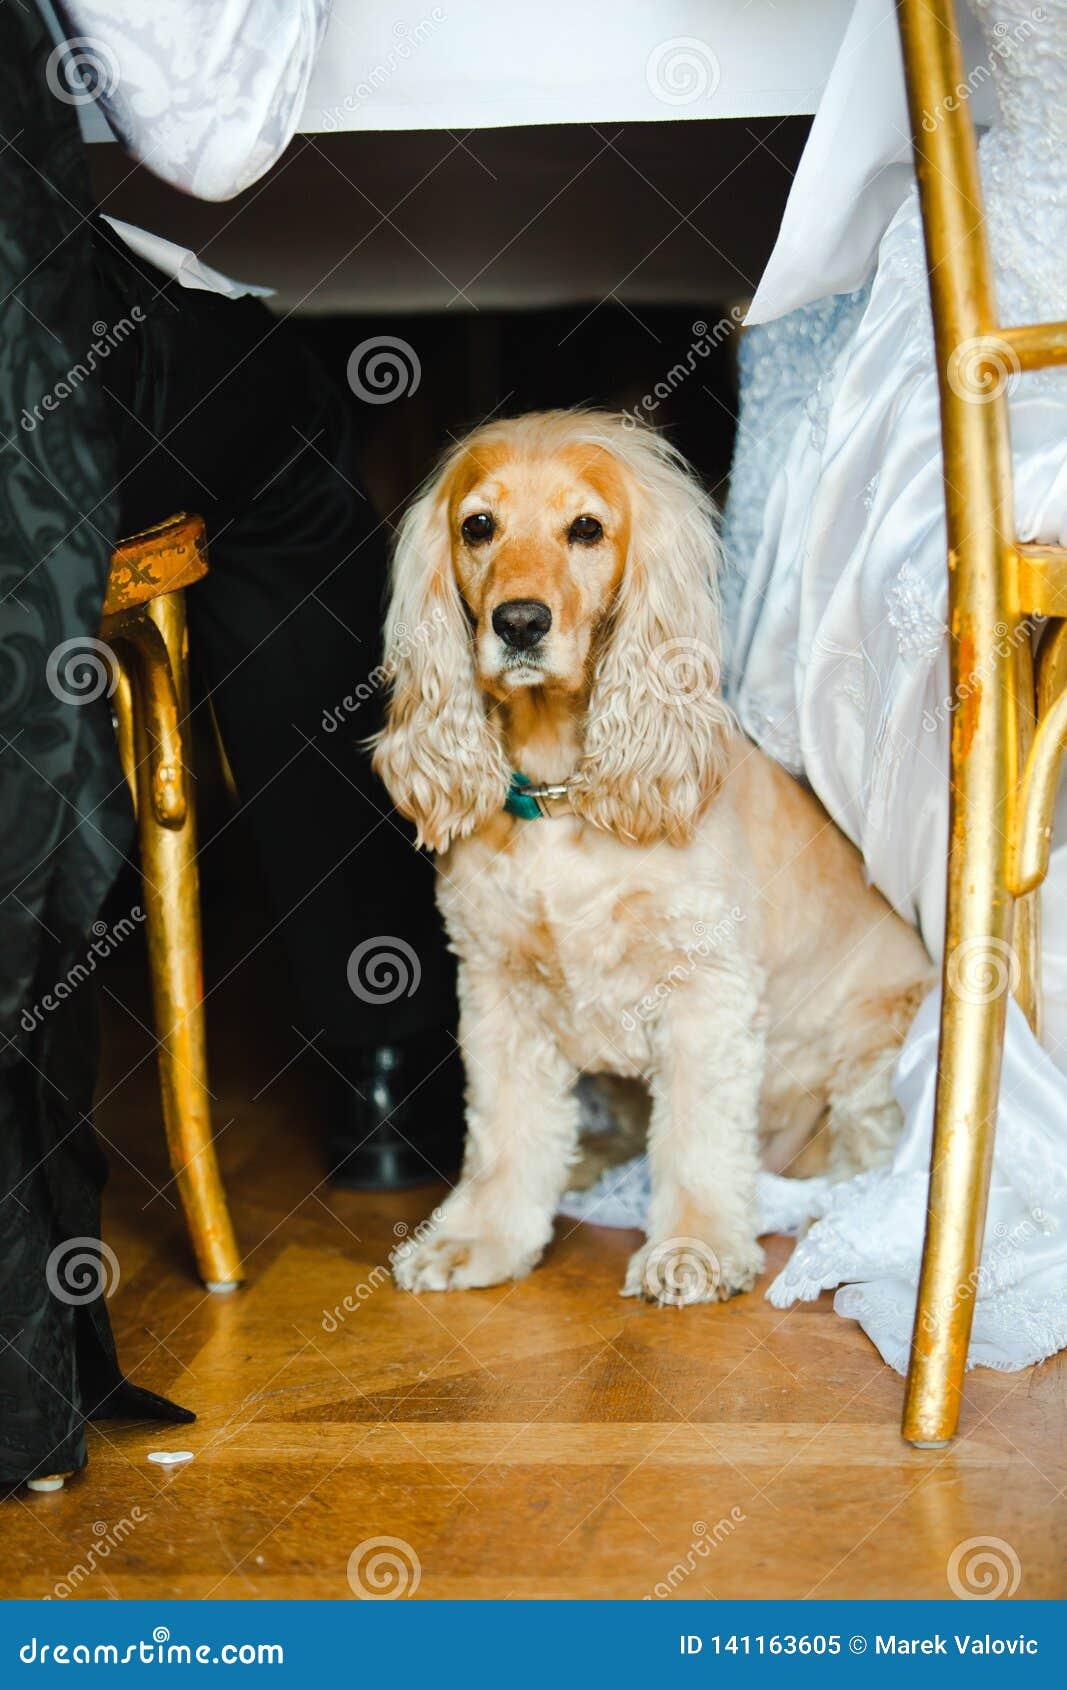 Pet om the wedding - English Cocker Spaniel